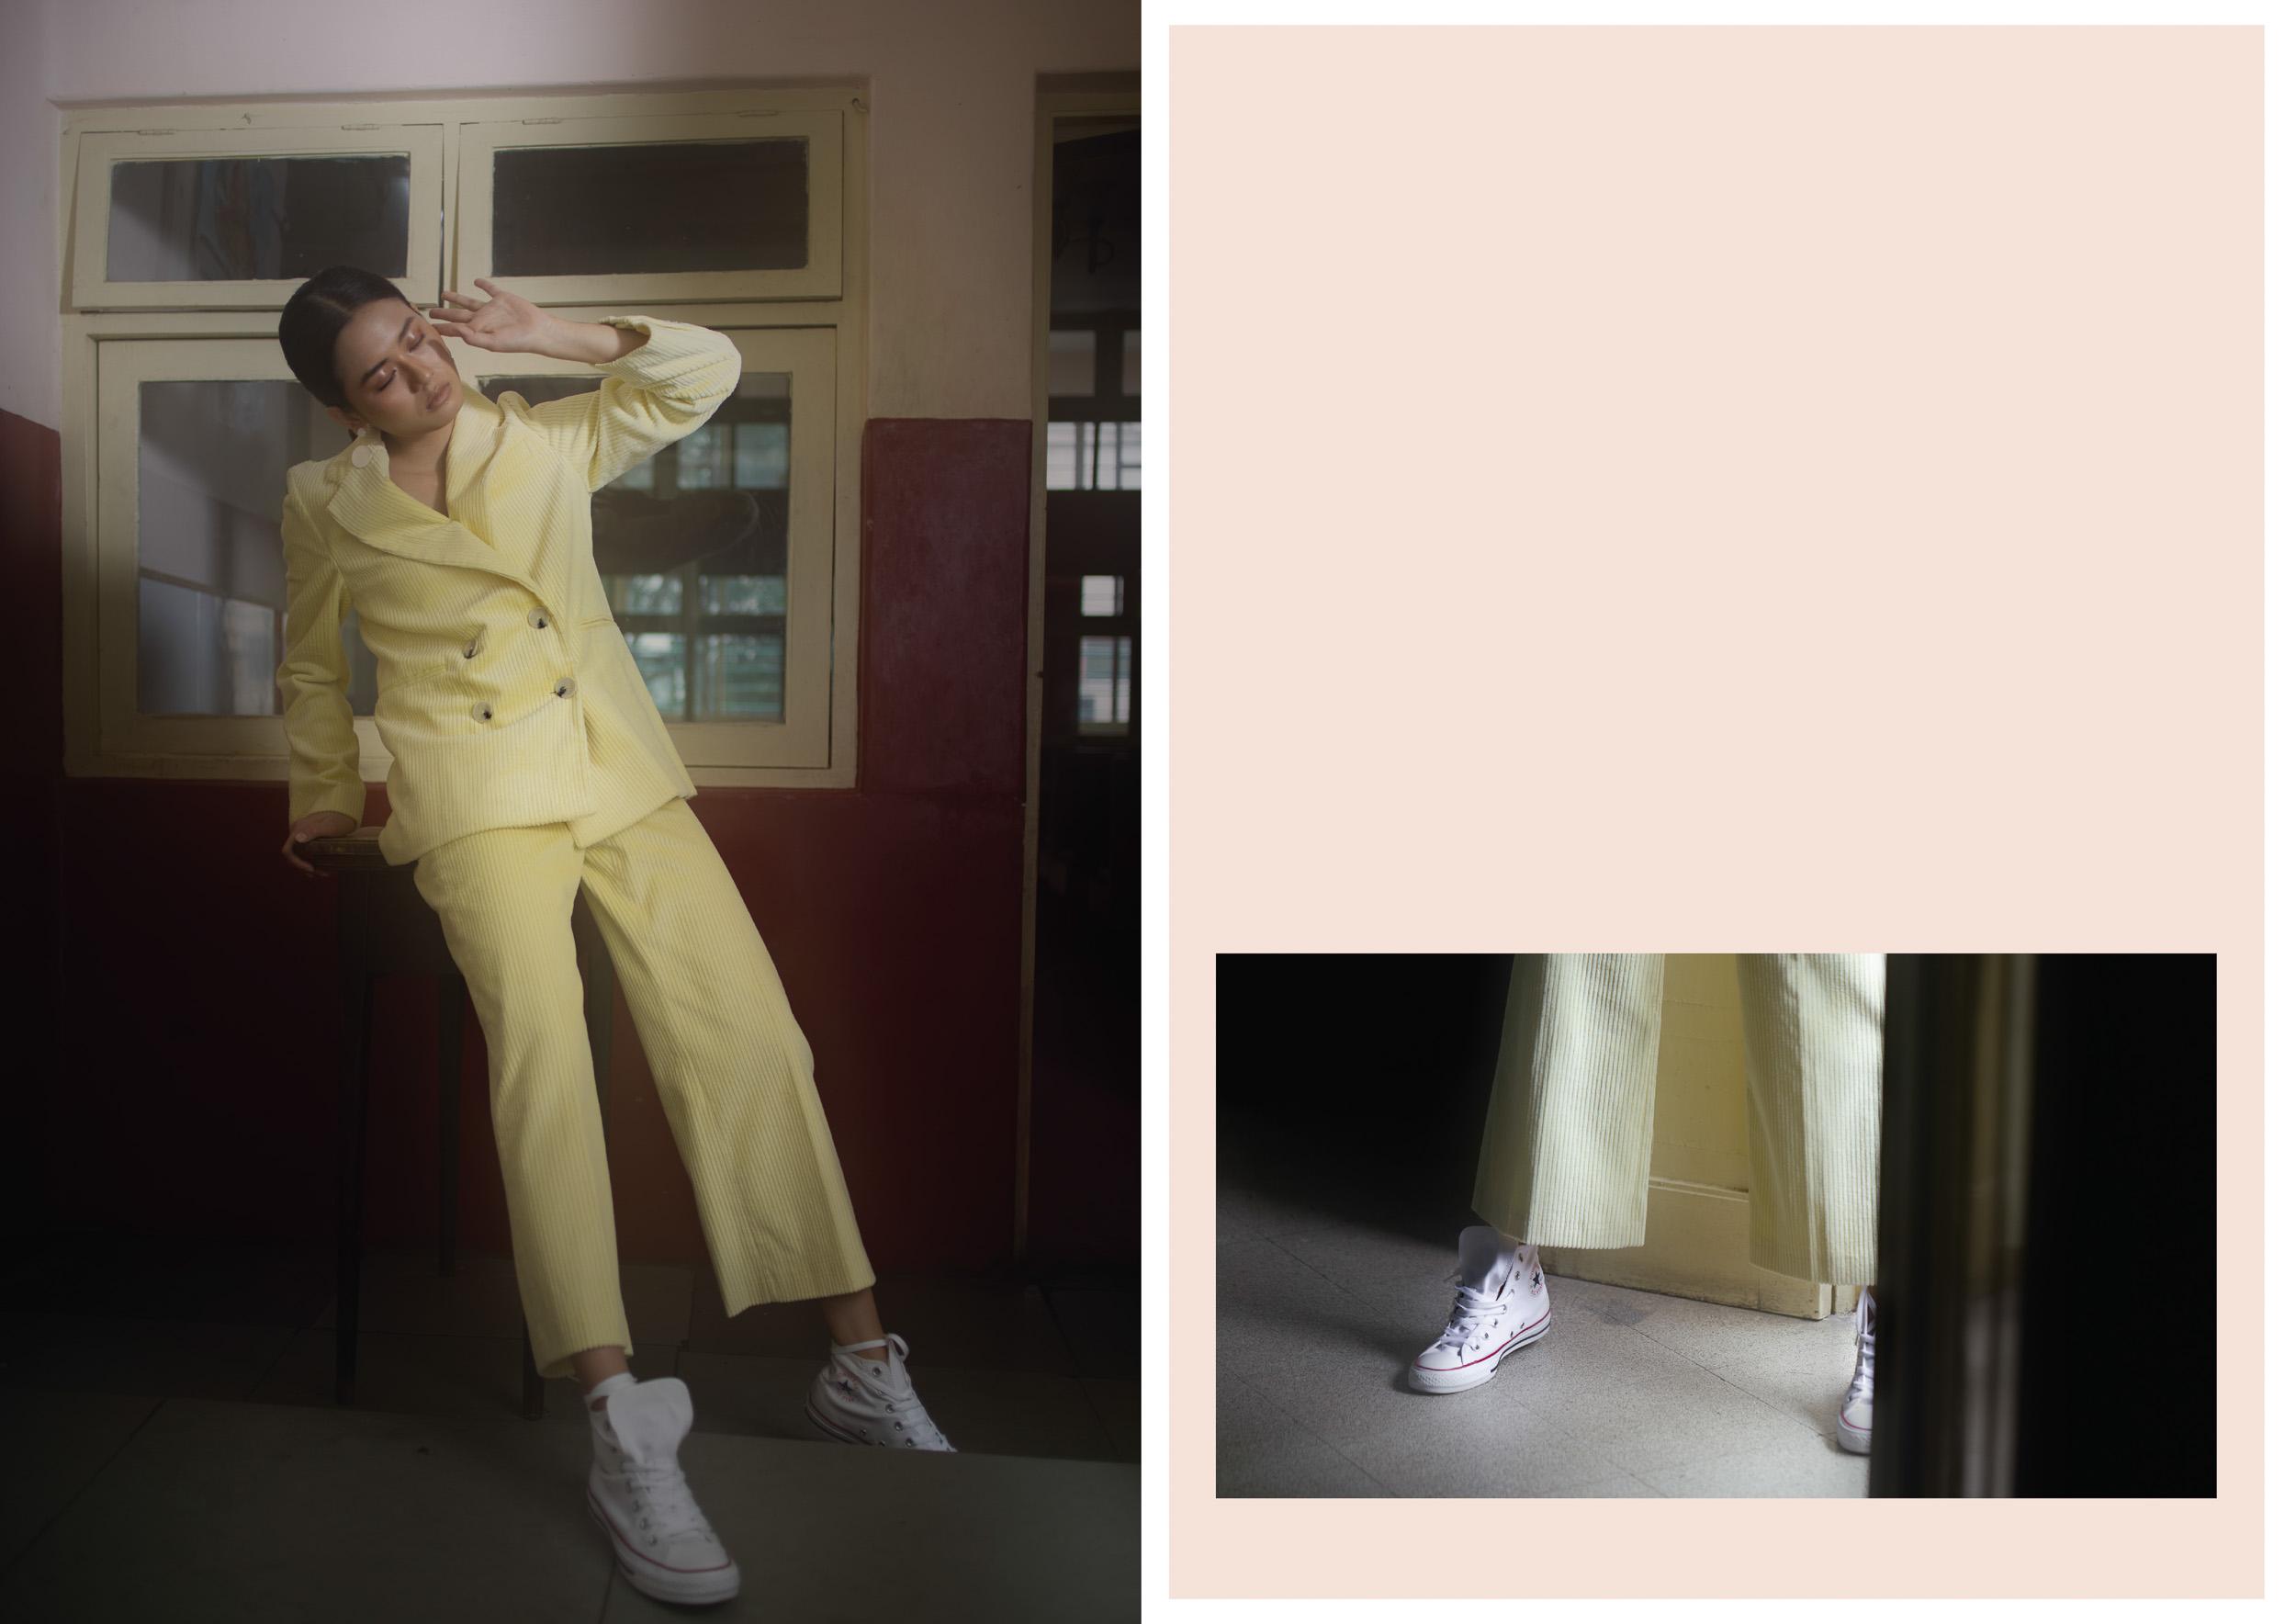 Sindhur_Photography_Fashion_StopTheExcuses-7.JPG